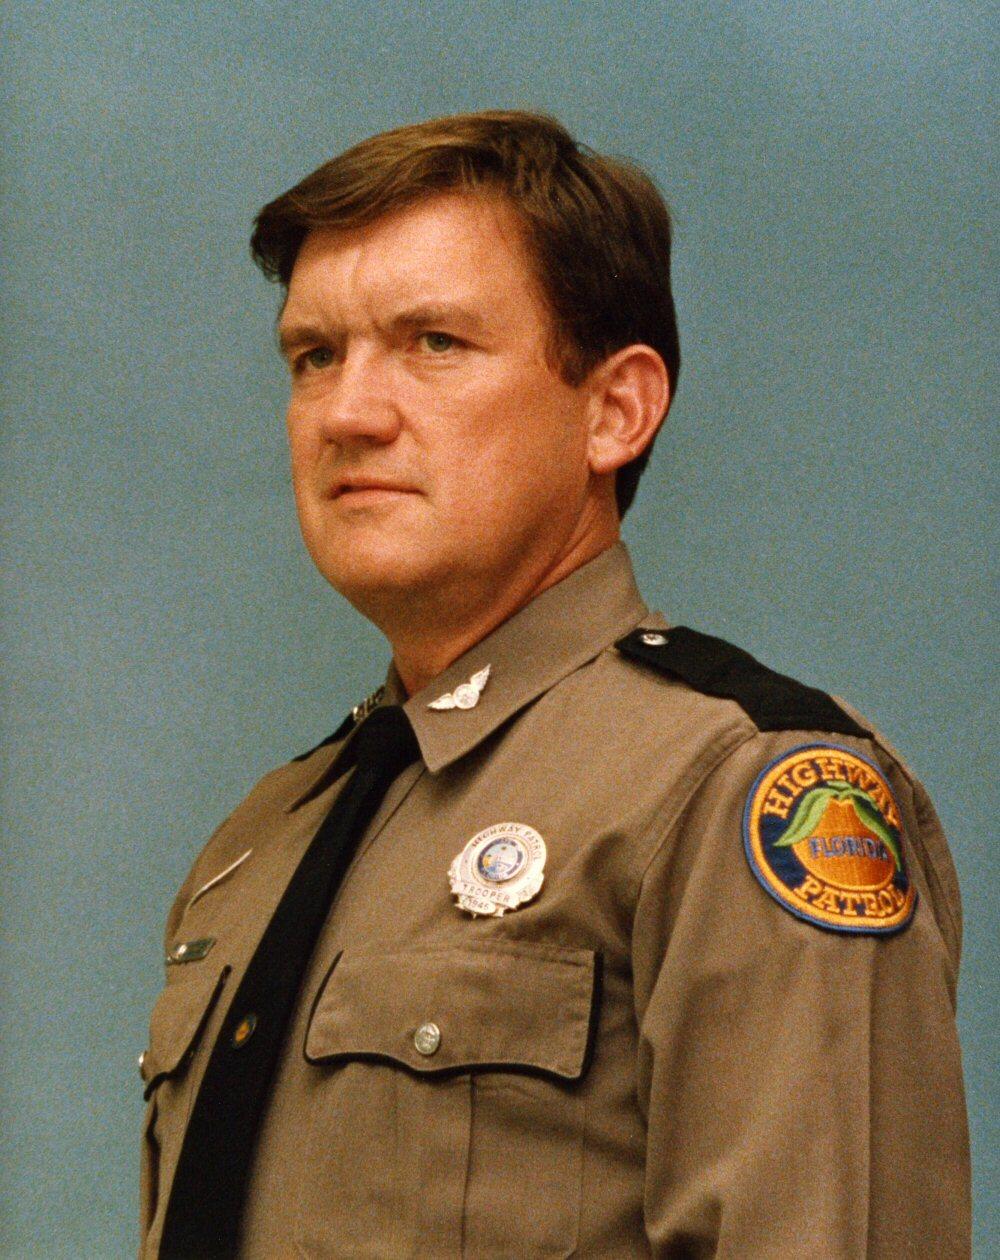 Trooper Lindell J. Gibbons Photo.jpg